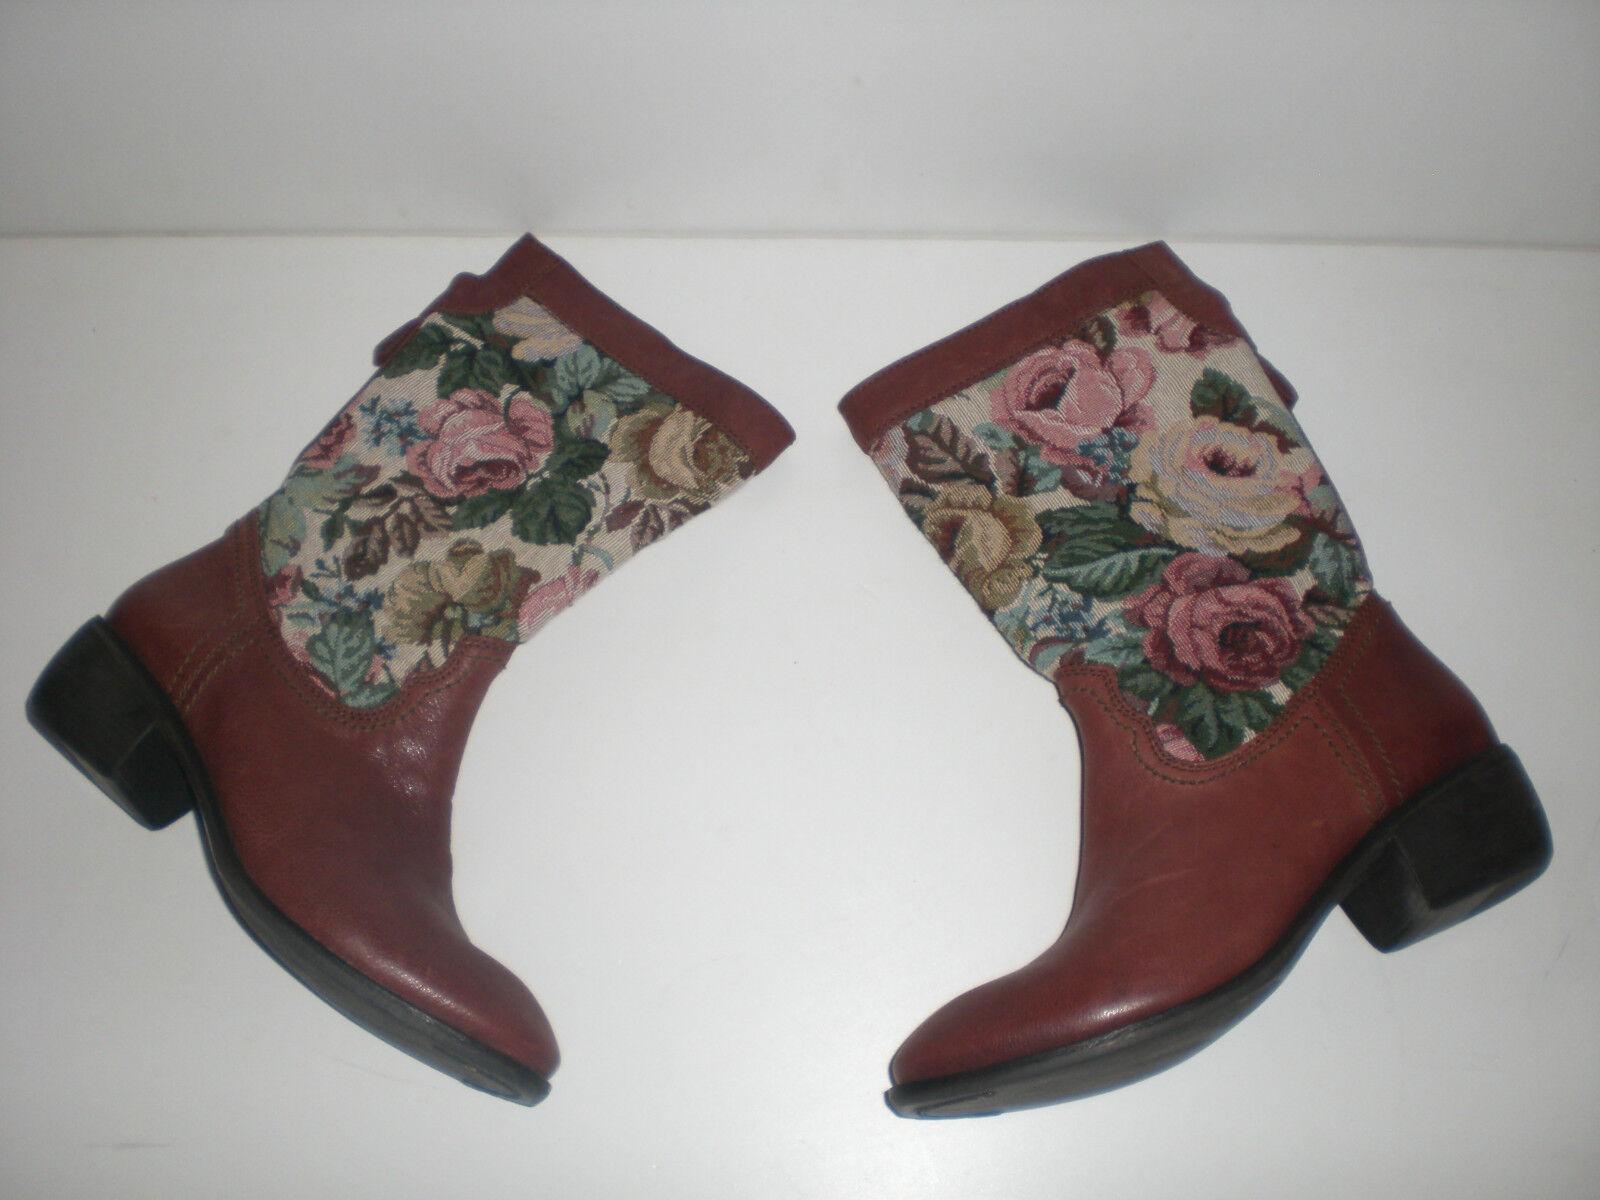 Ethno Boho Stiefel Filipe Sousa Leder Stiefel Schuhe   Gr.38,neuwertig